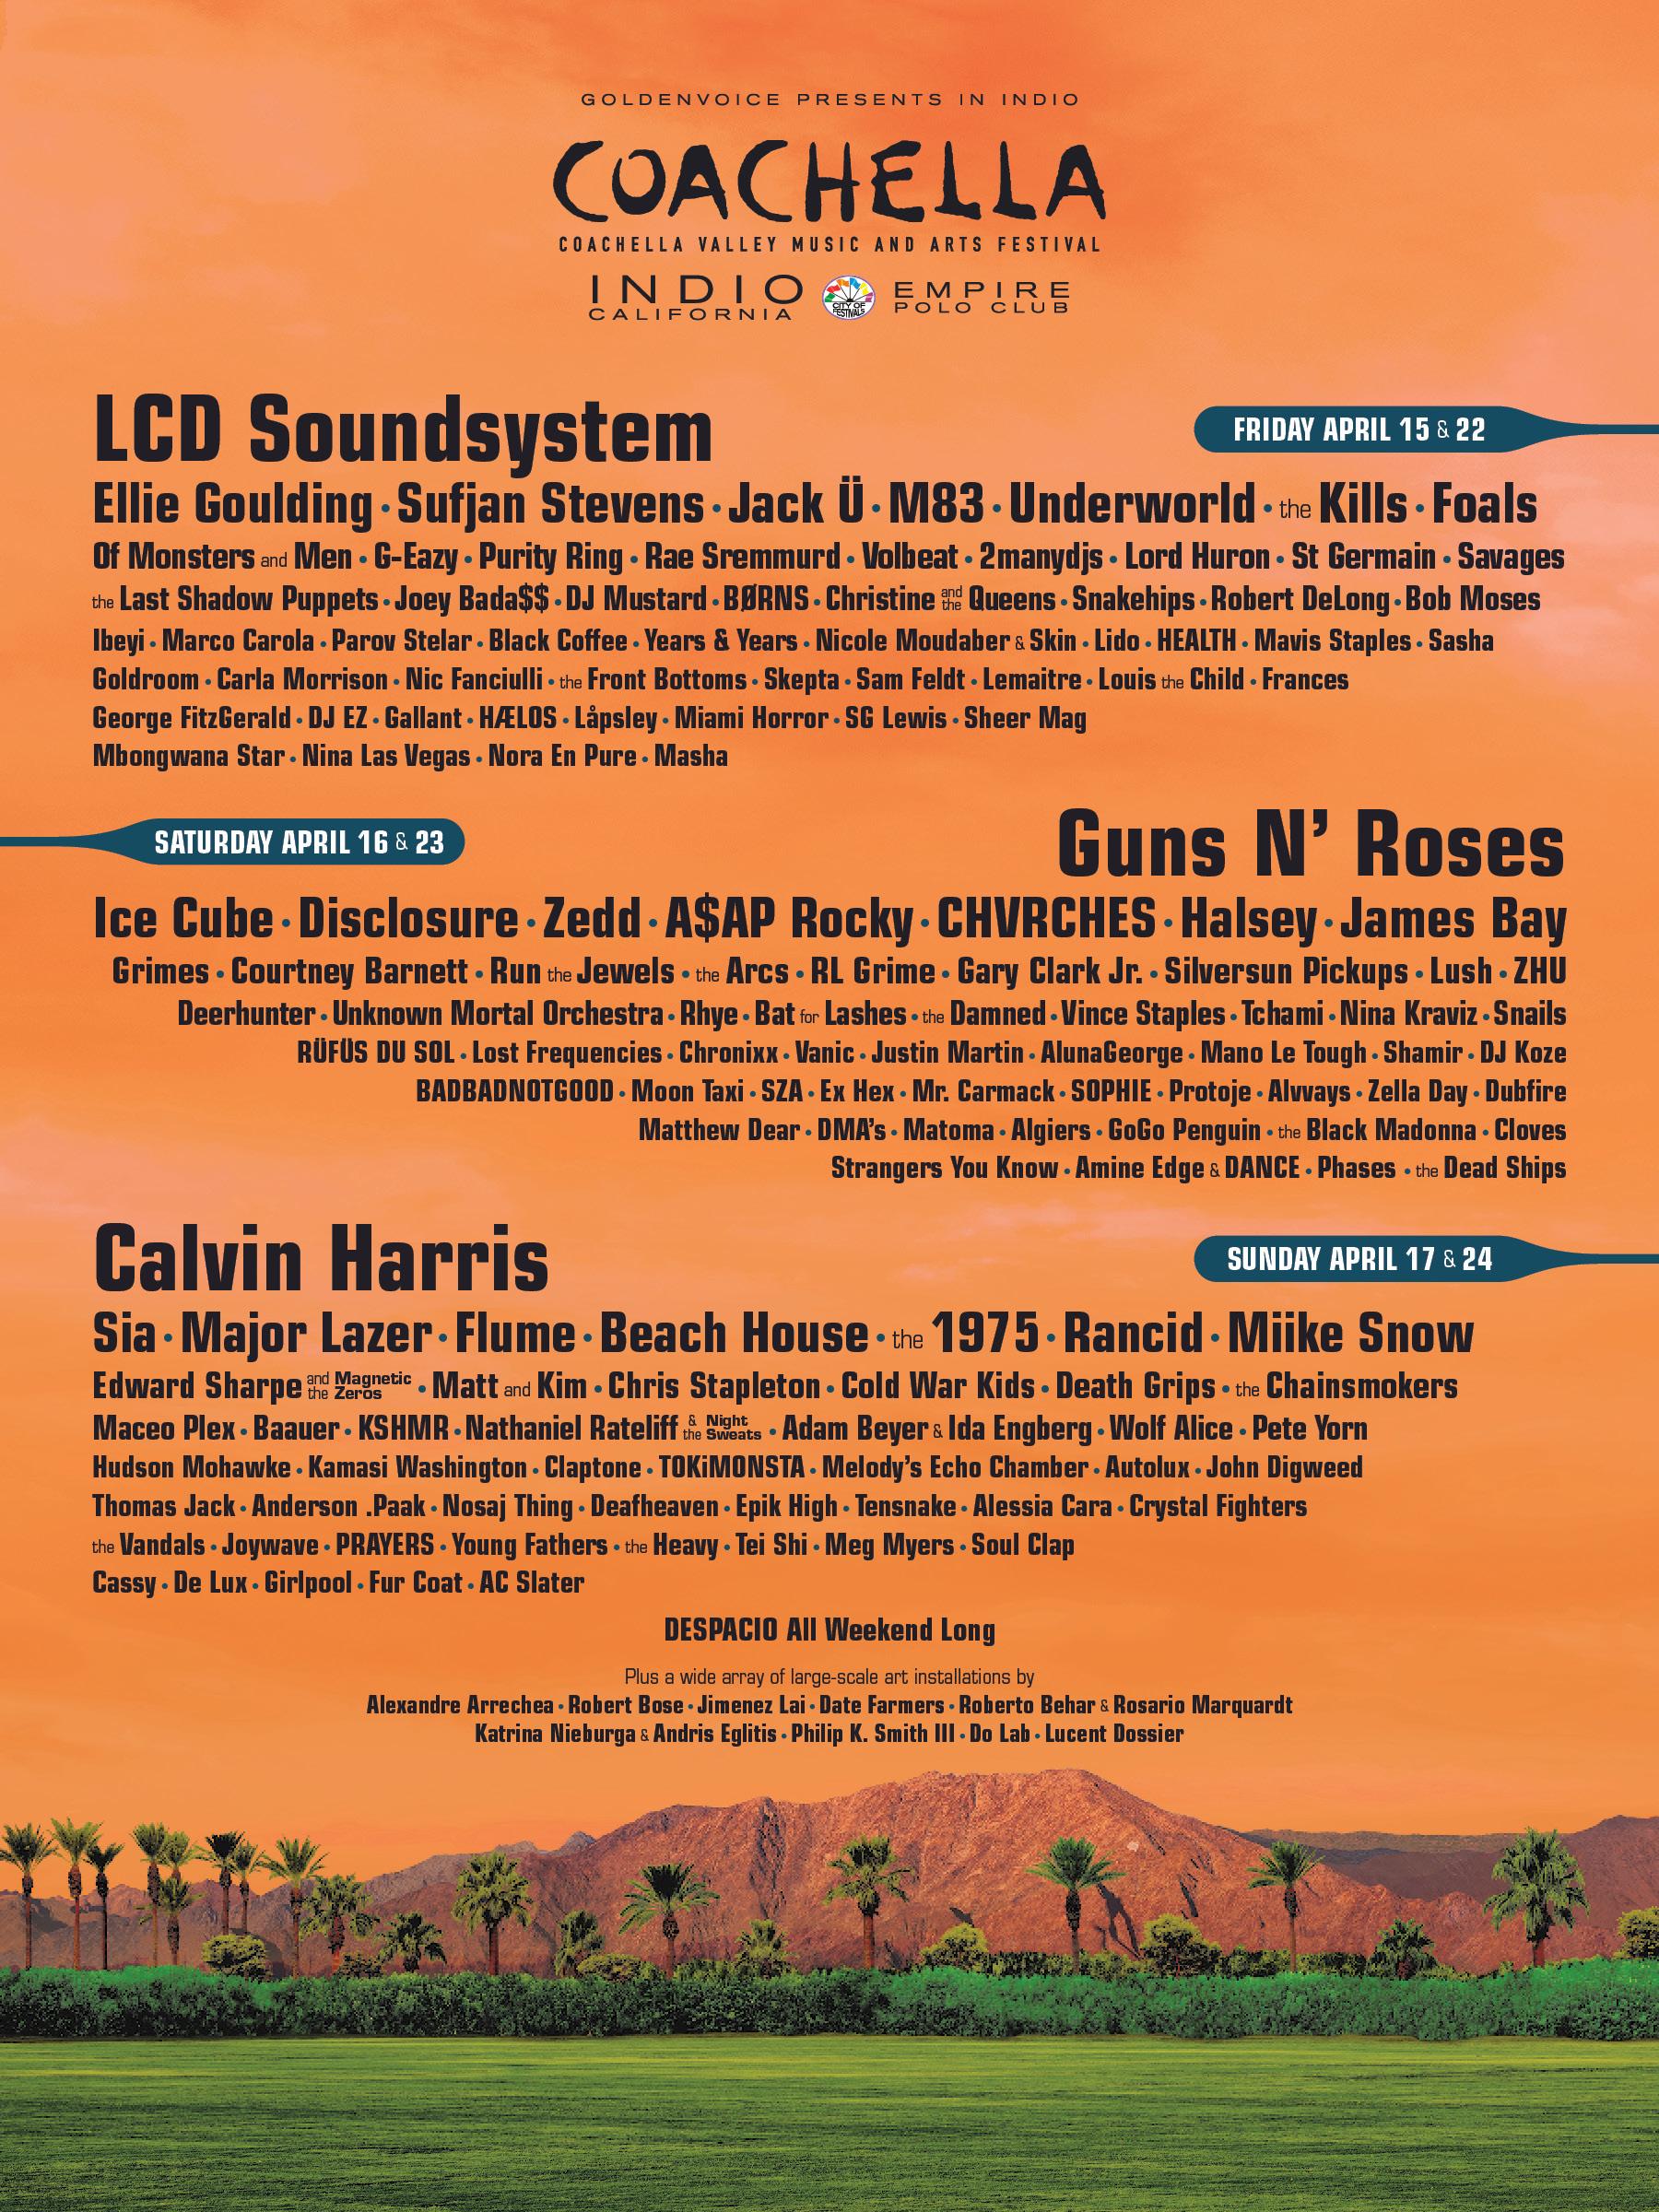 Coachella Lineup 2016 Poster